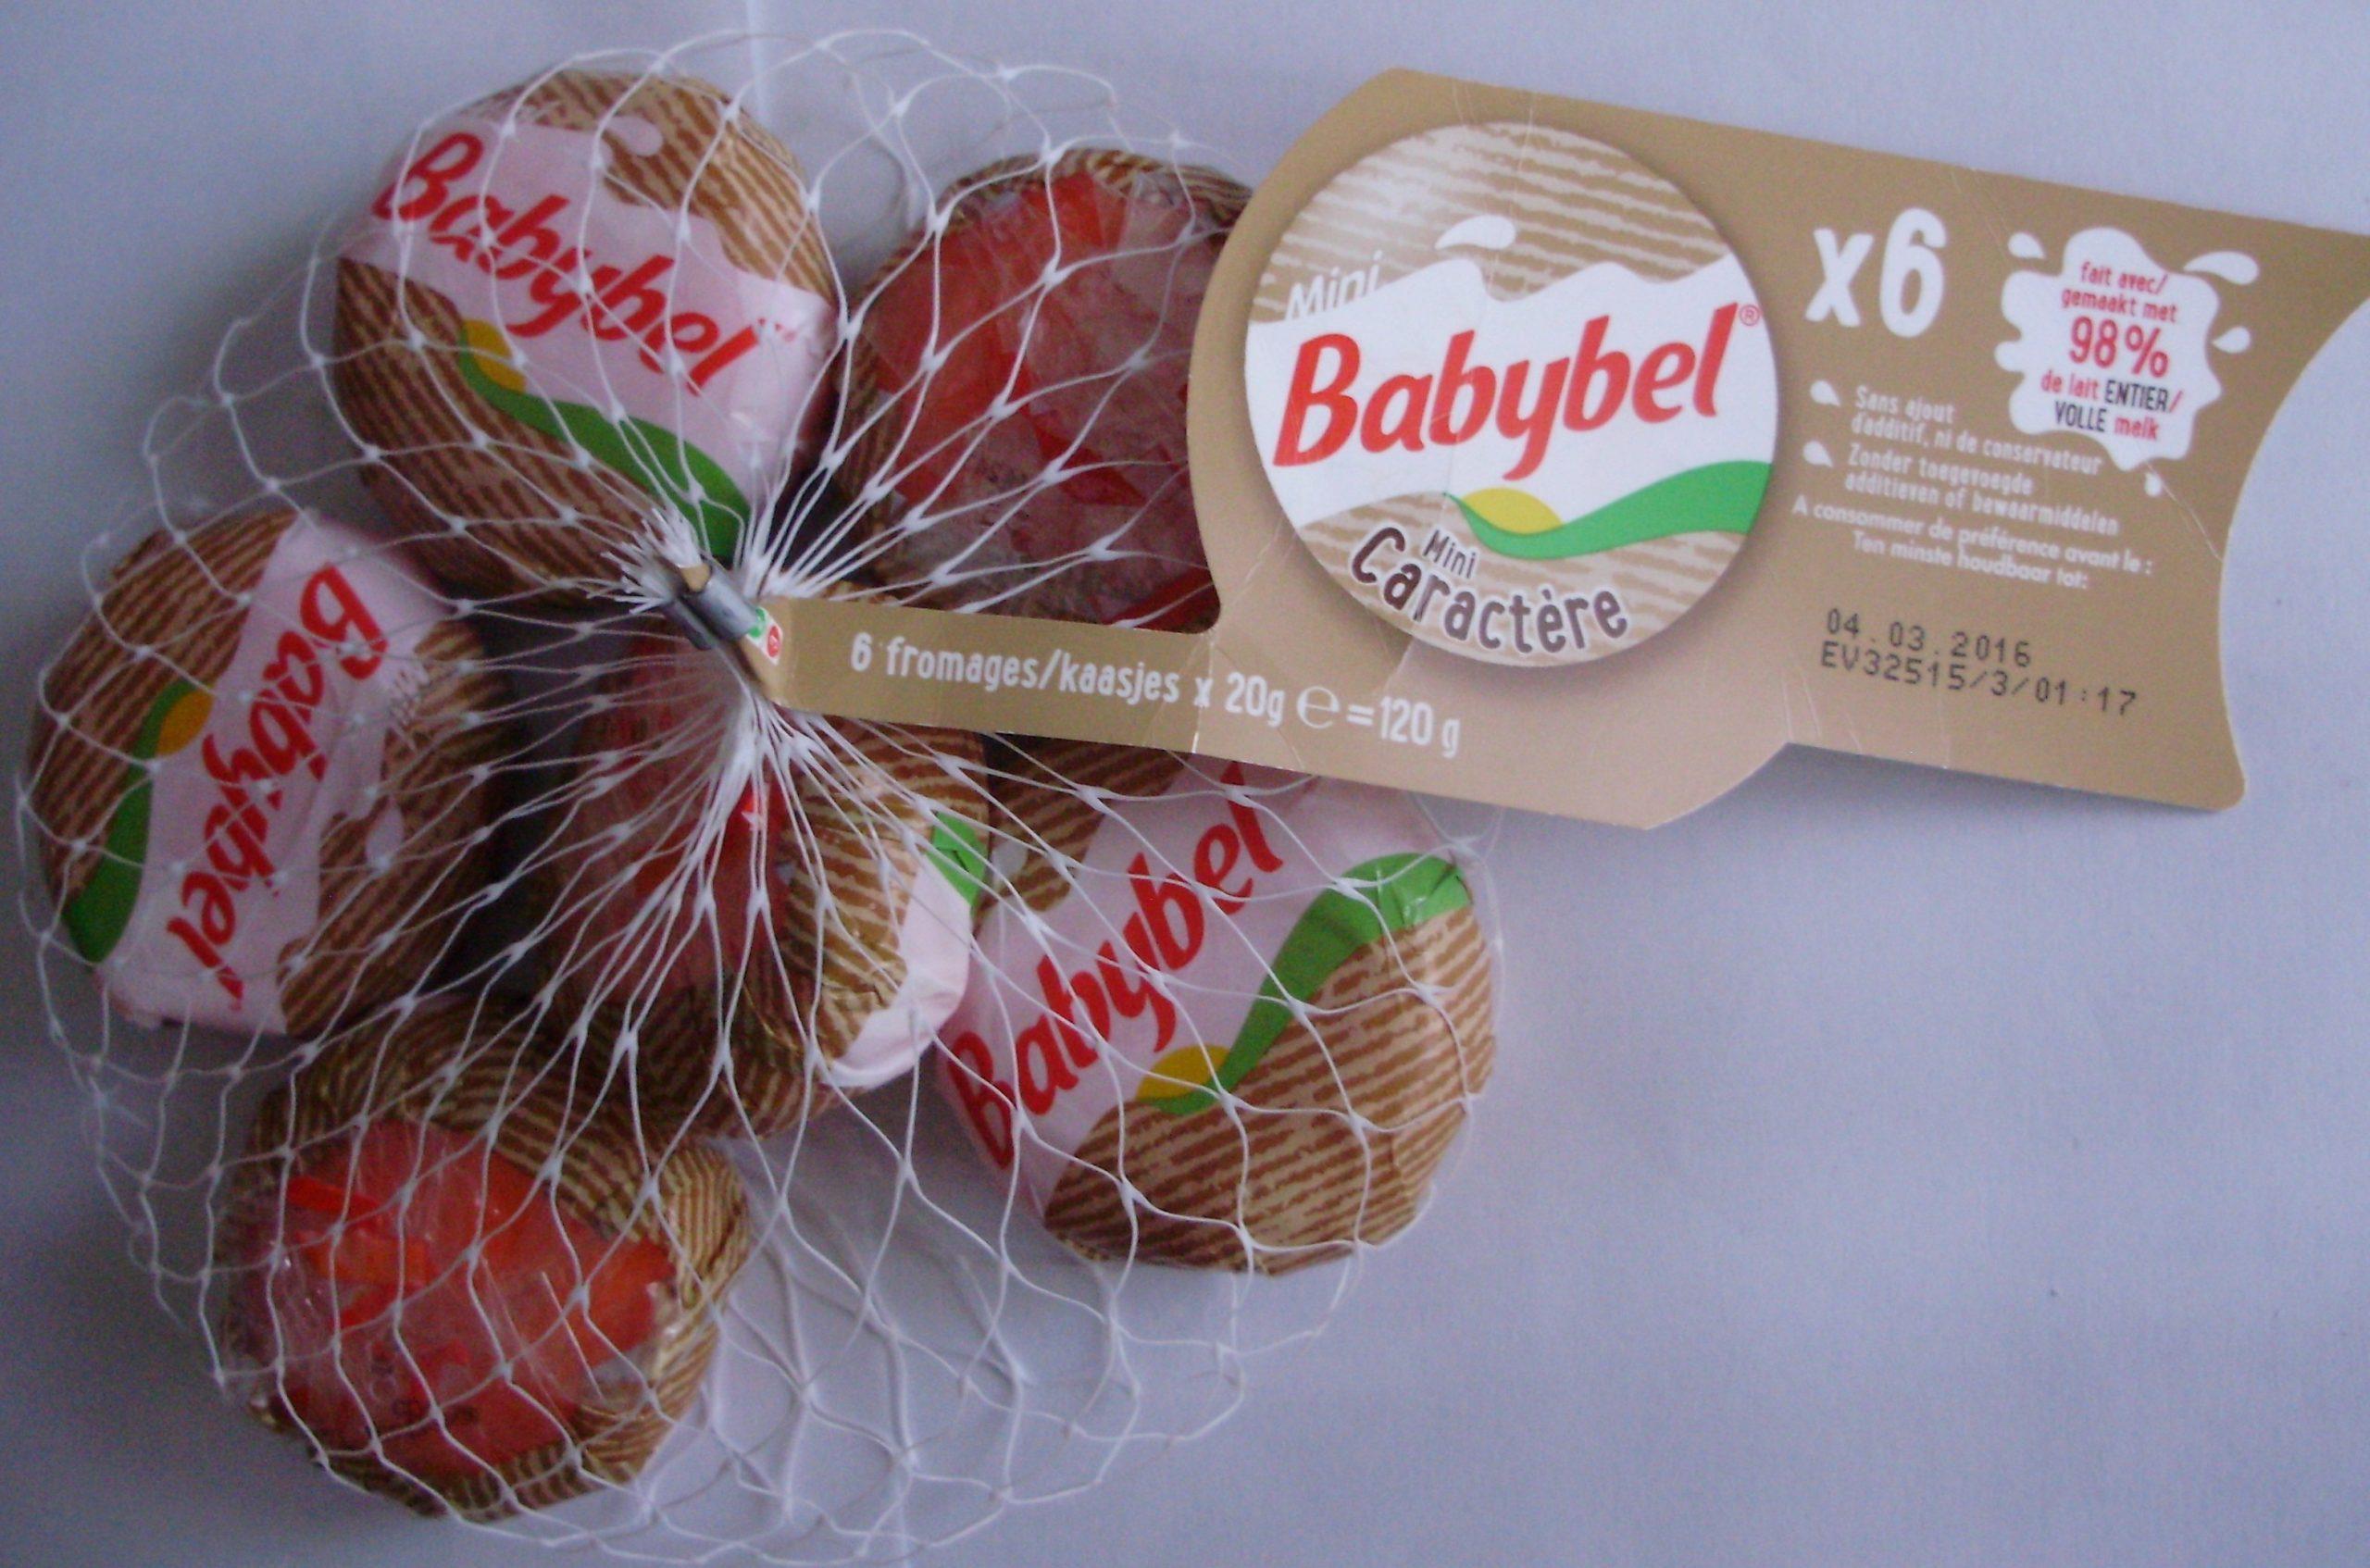 Babybel kaasjes is geen babykaasje - Duidelijk verschil tussen beide - www.NoordHollandseBoerenkaas.nl